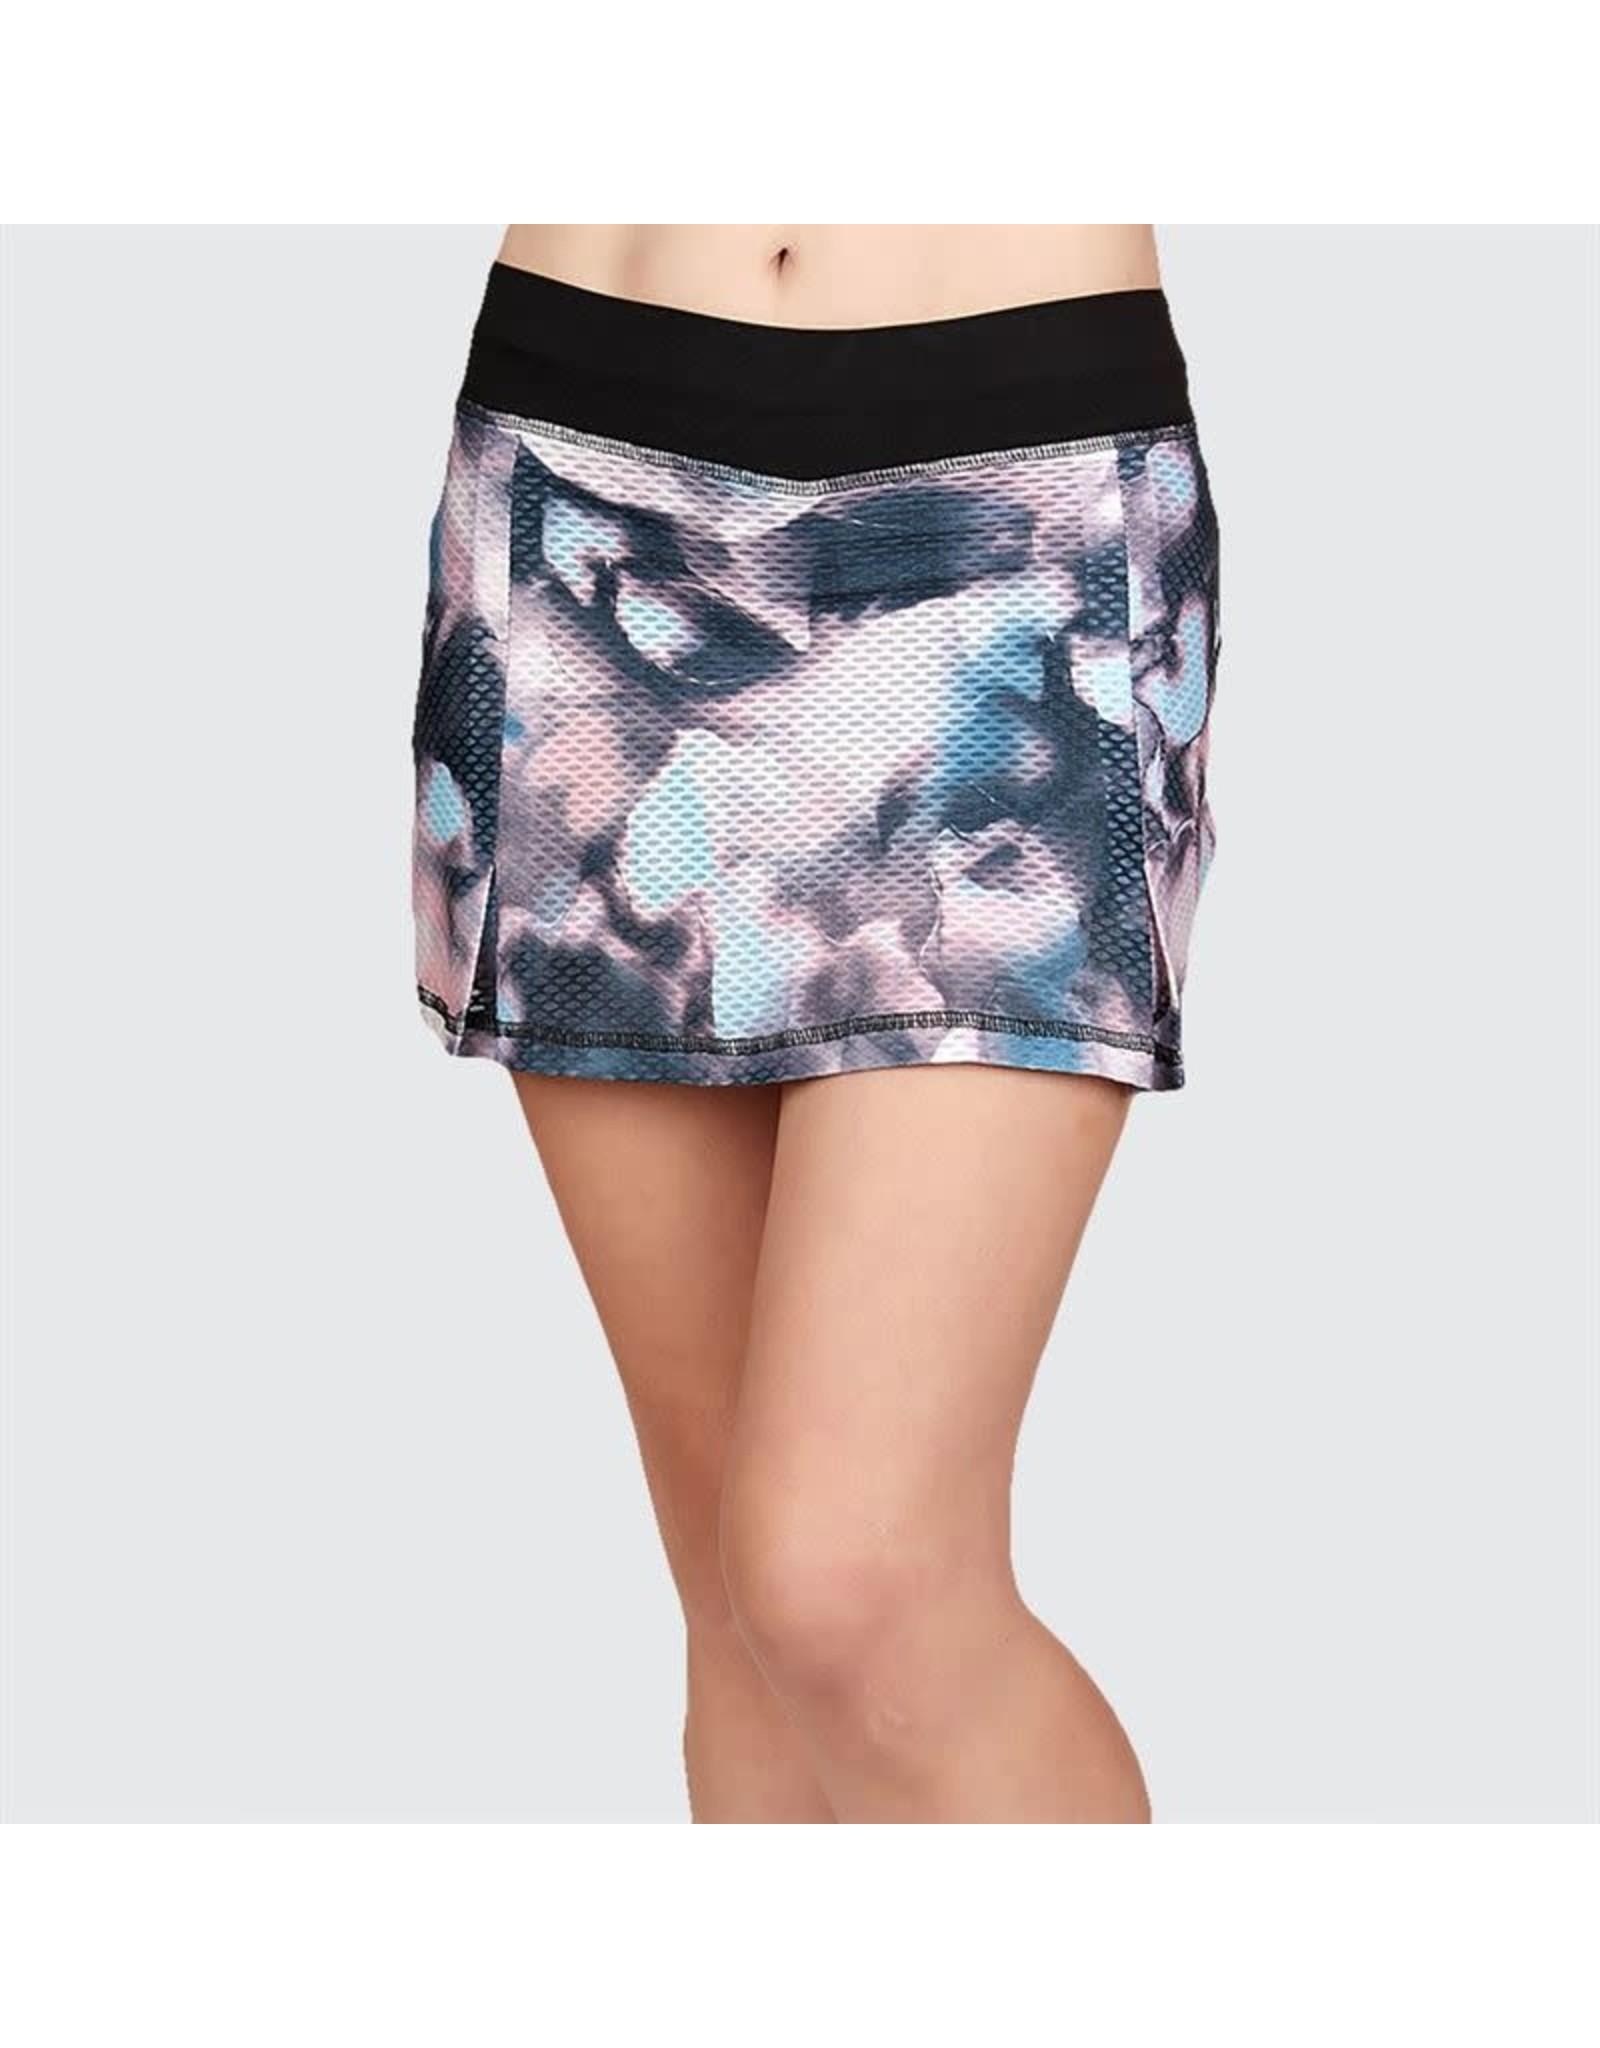 Sofibella Air Flow 13 inch Skirt